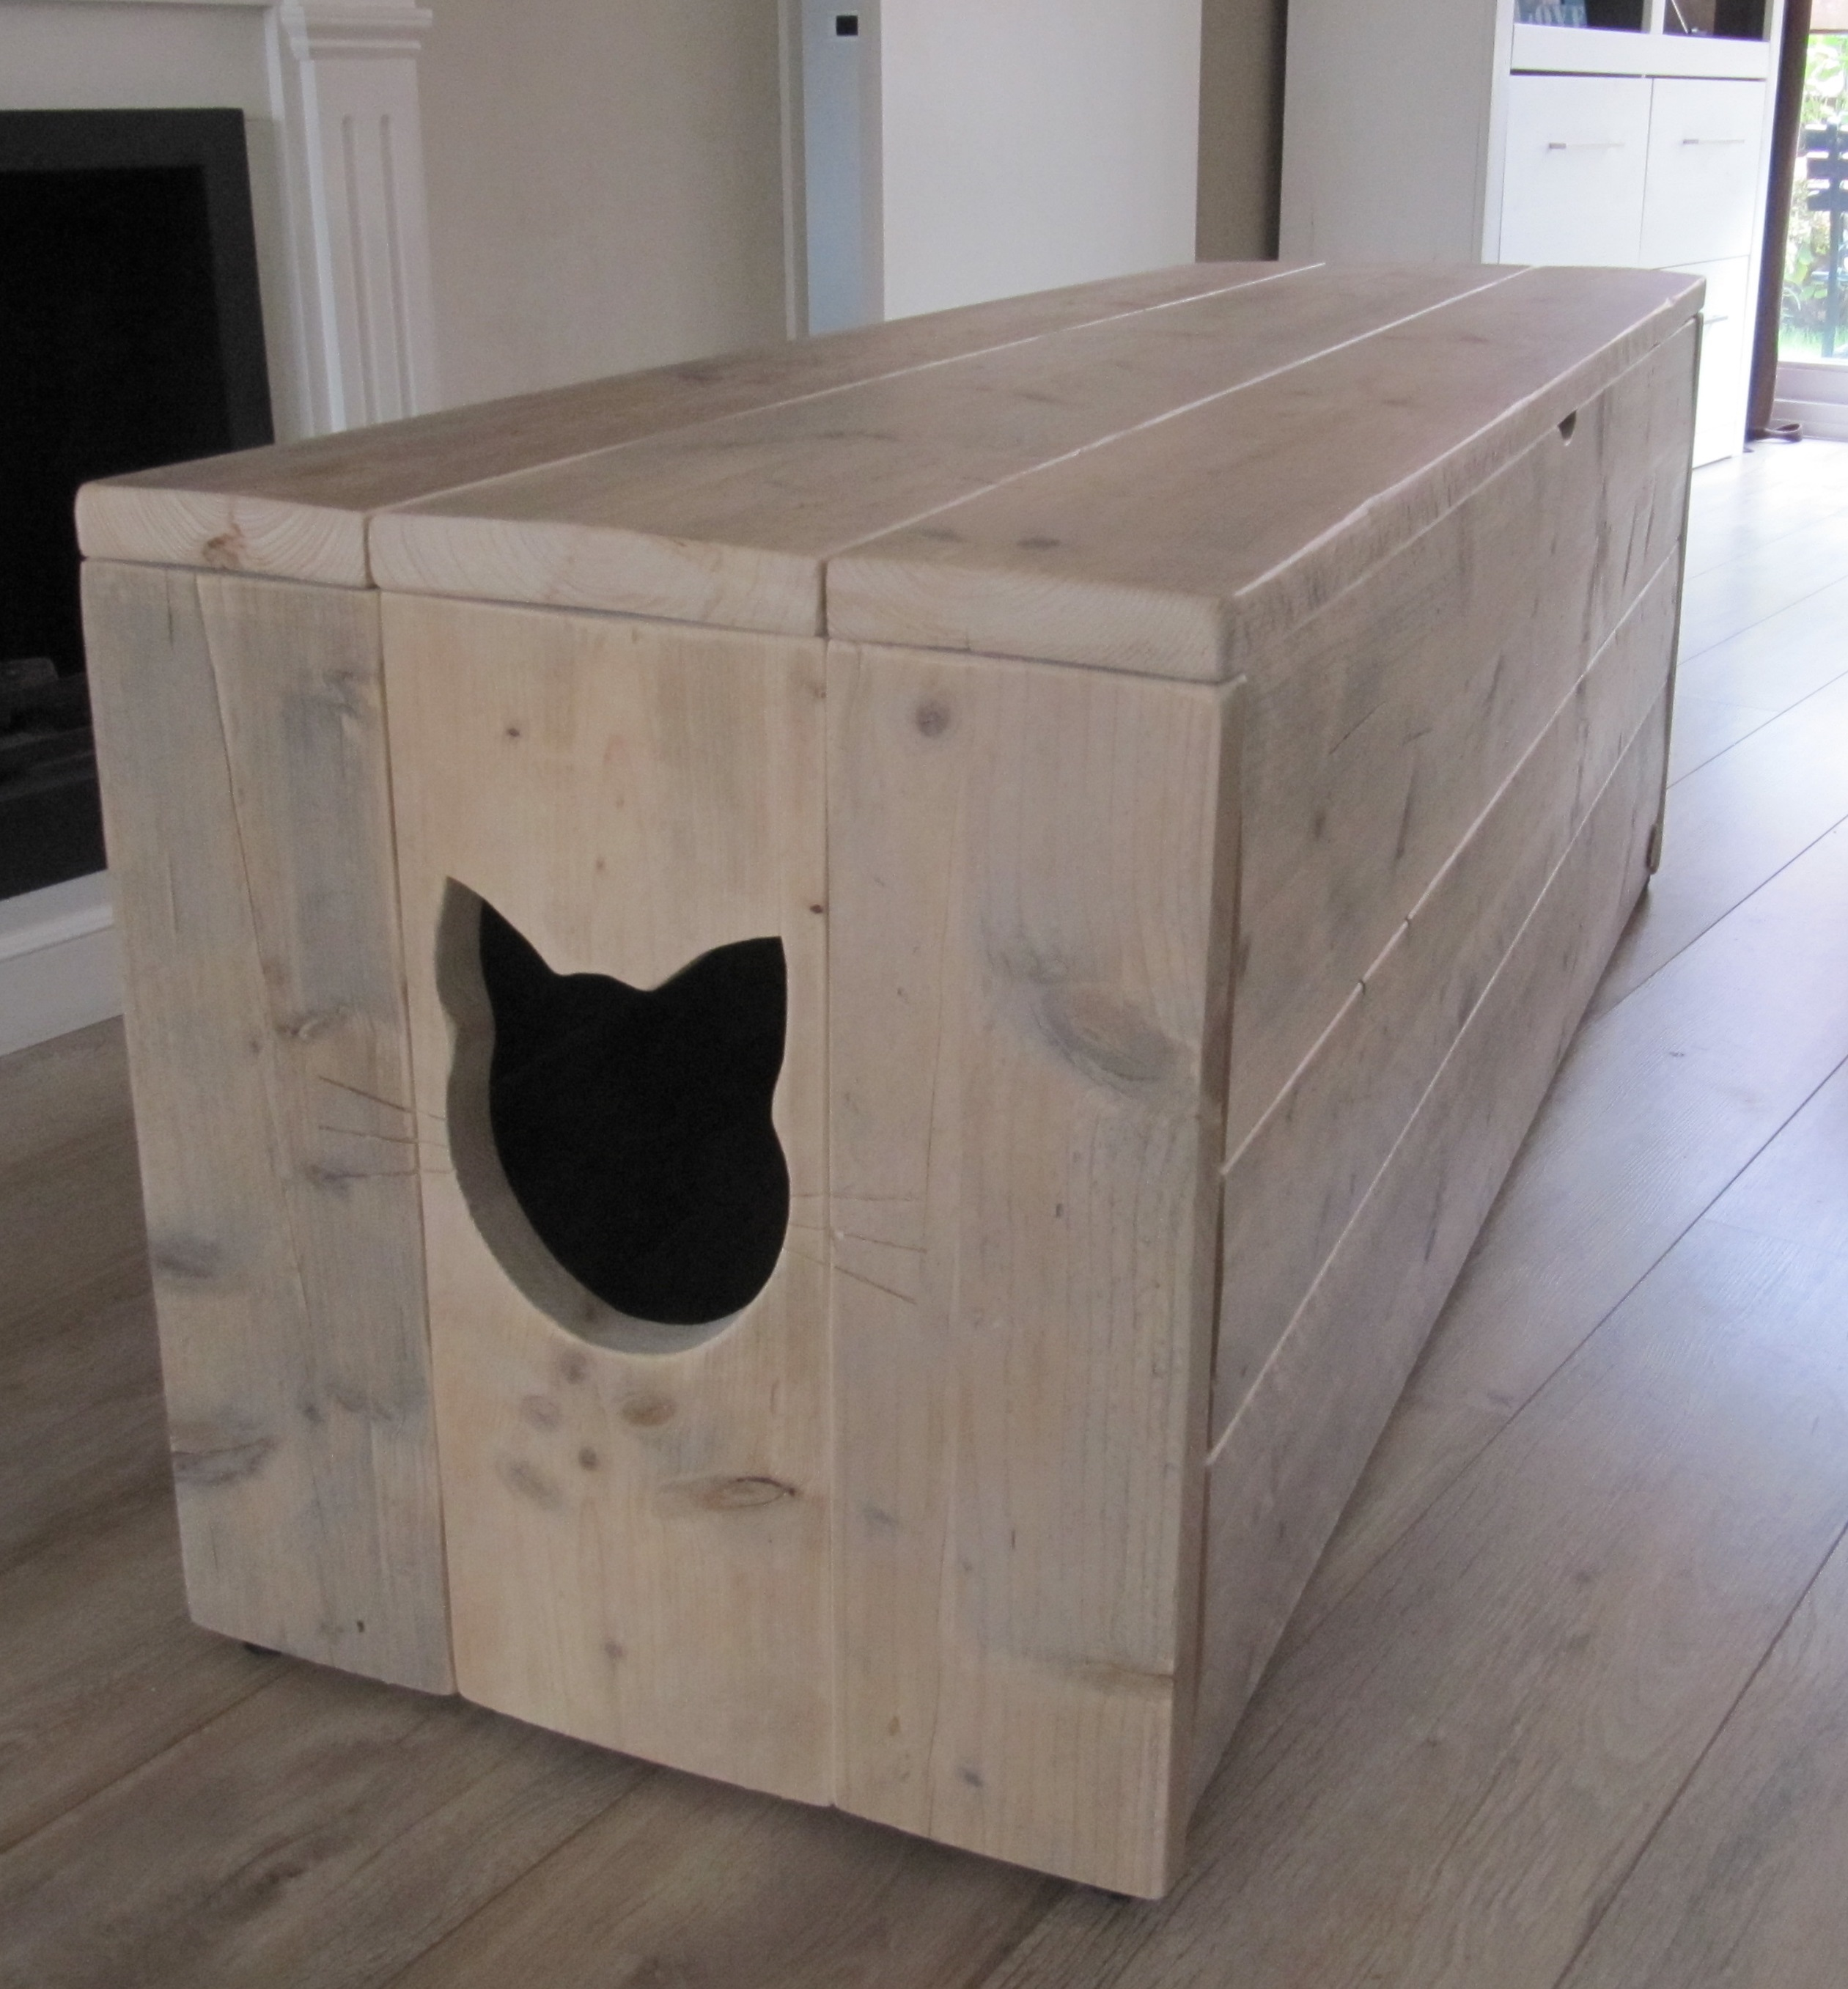 Kattenbak Kast Marianne Van Gebruikt Steigerhout